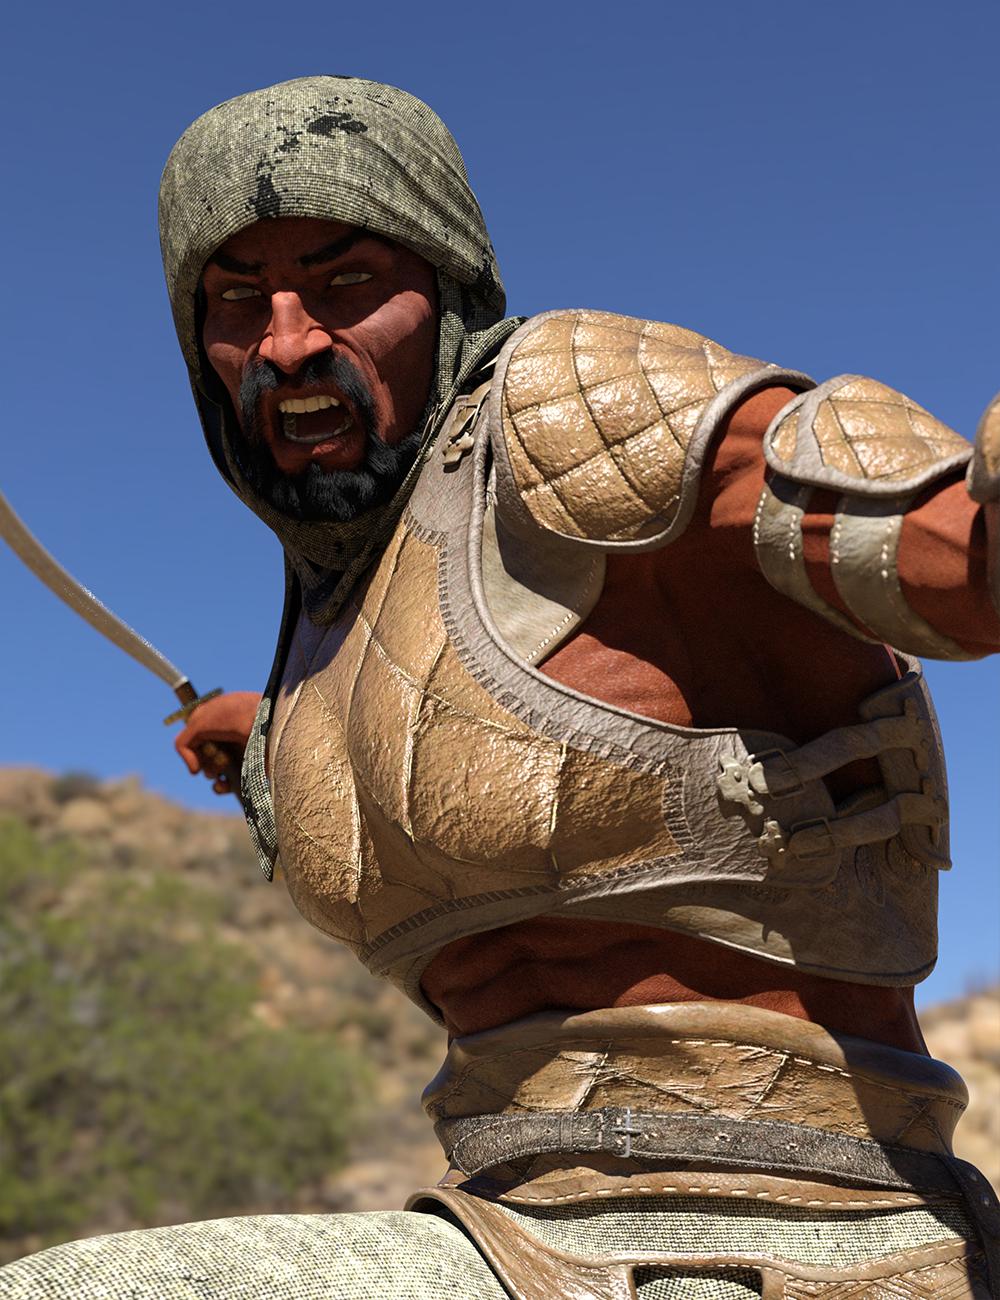 Bedu Desert Warrior Outfit for Genesis 8 Male(s) by: Sixus1 Media, 3D Models by Daz 3D